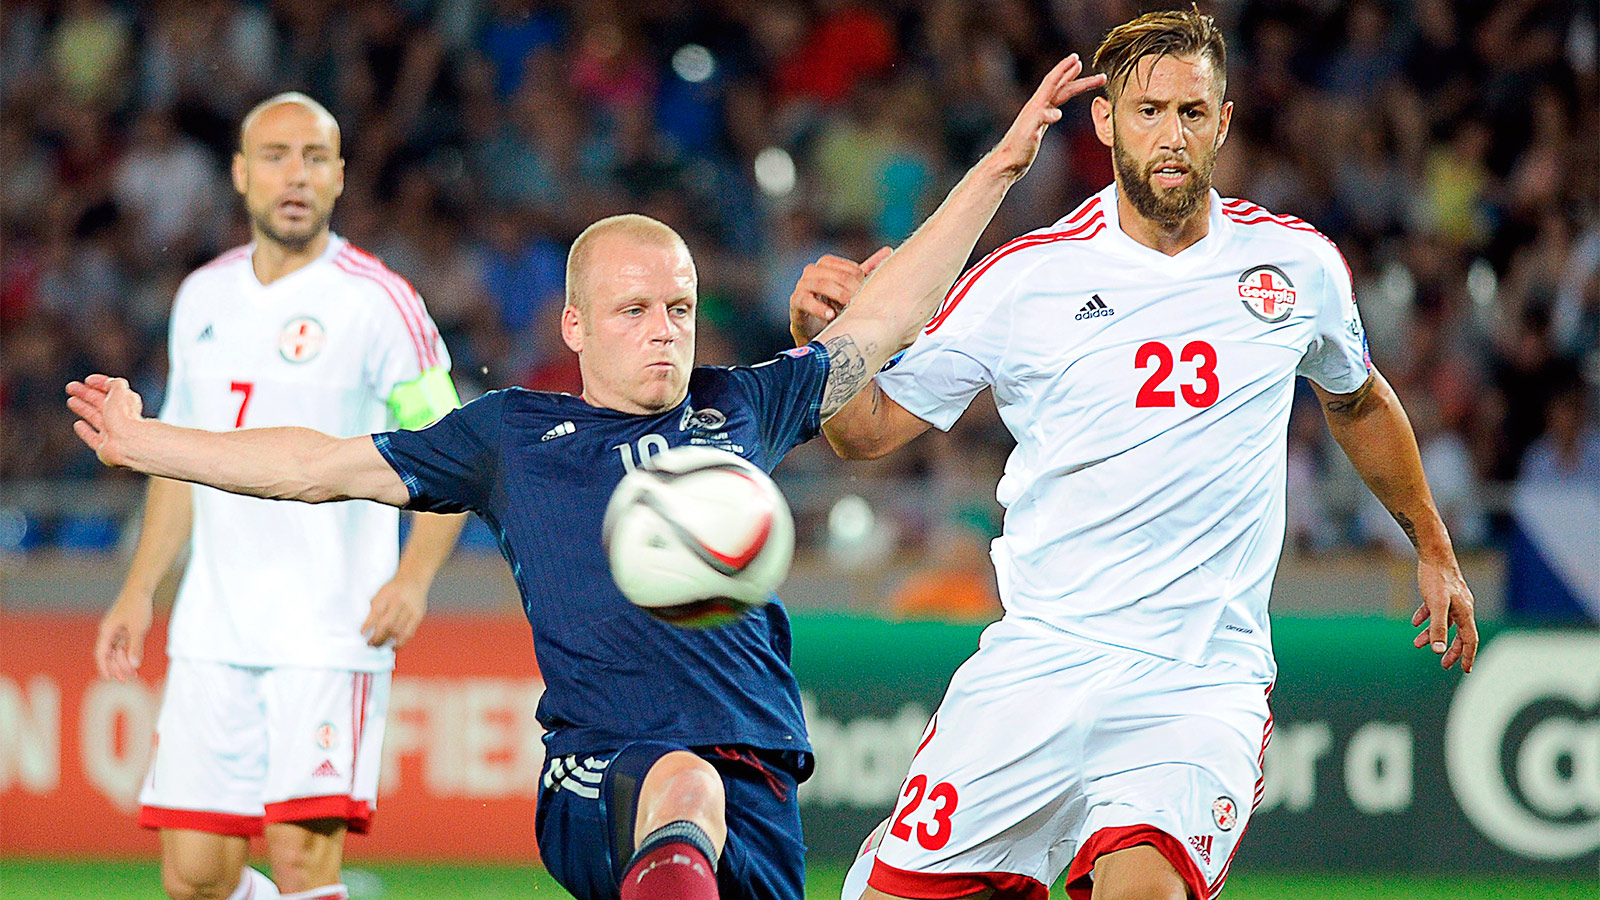 Scotland's Euro 2016 hopes take serious blow with loss at Georgia